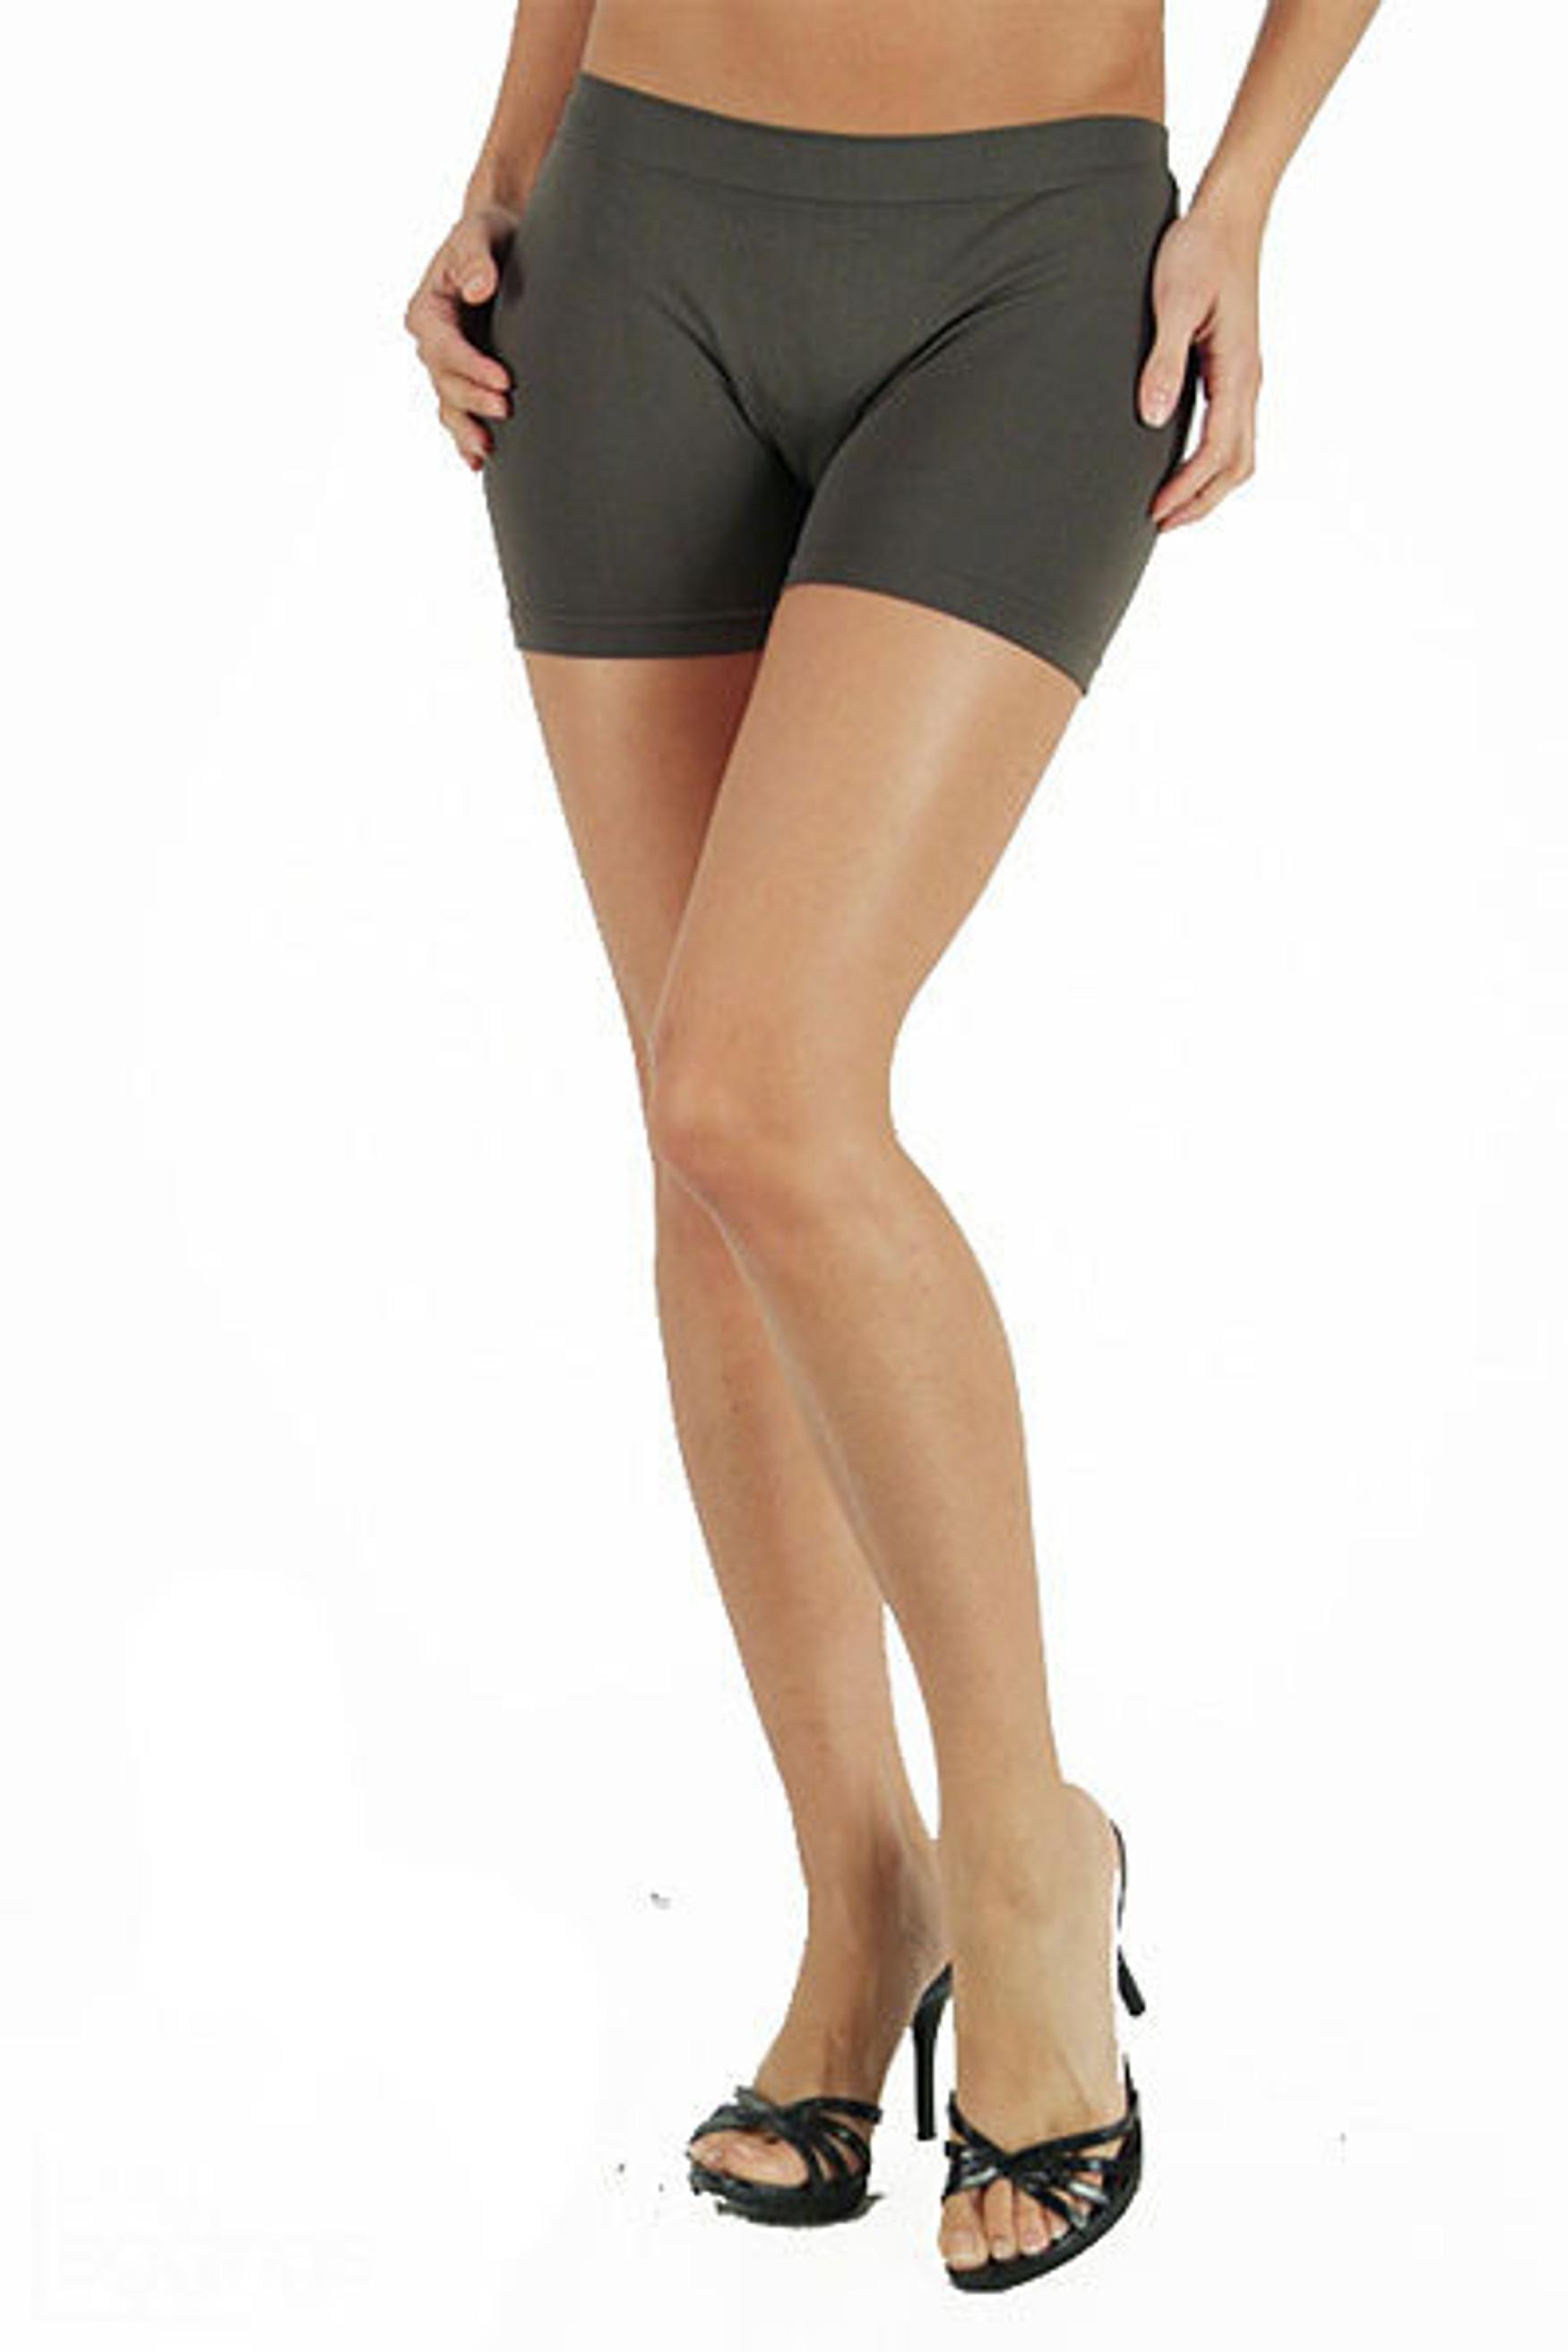 Nylon Spandex Shorts - Plus Size